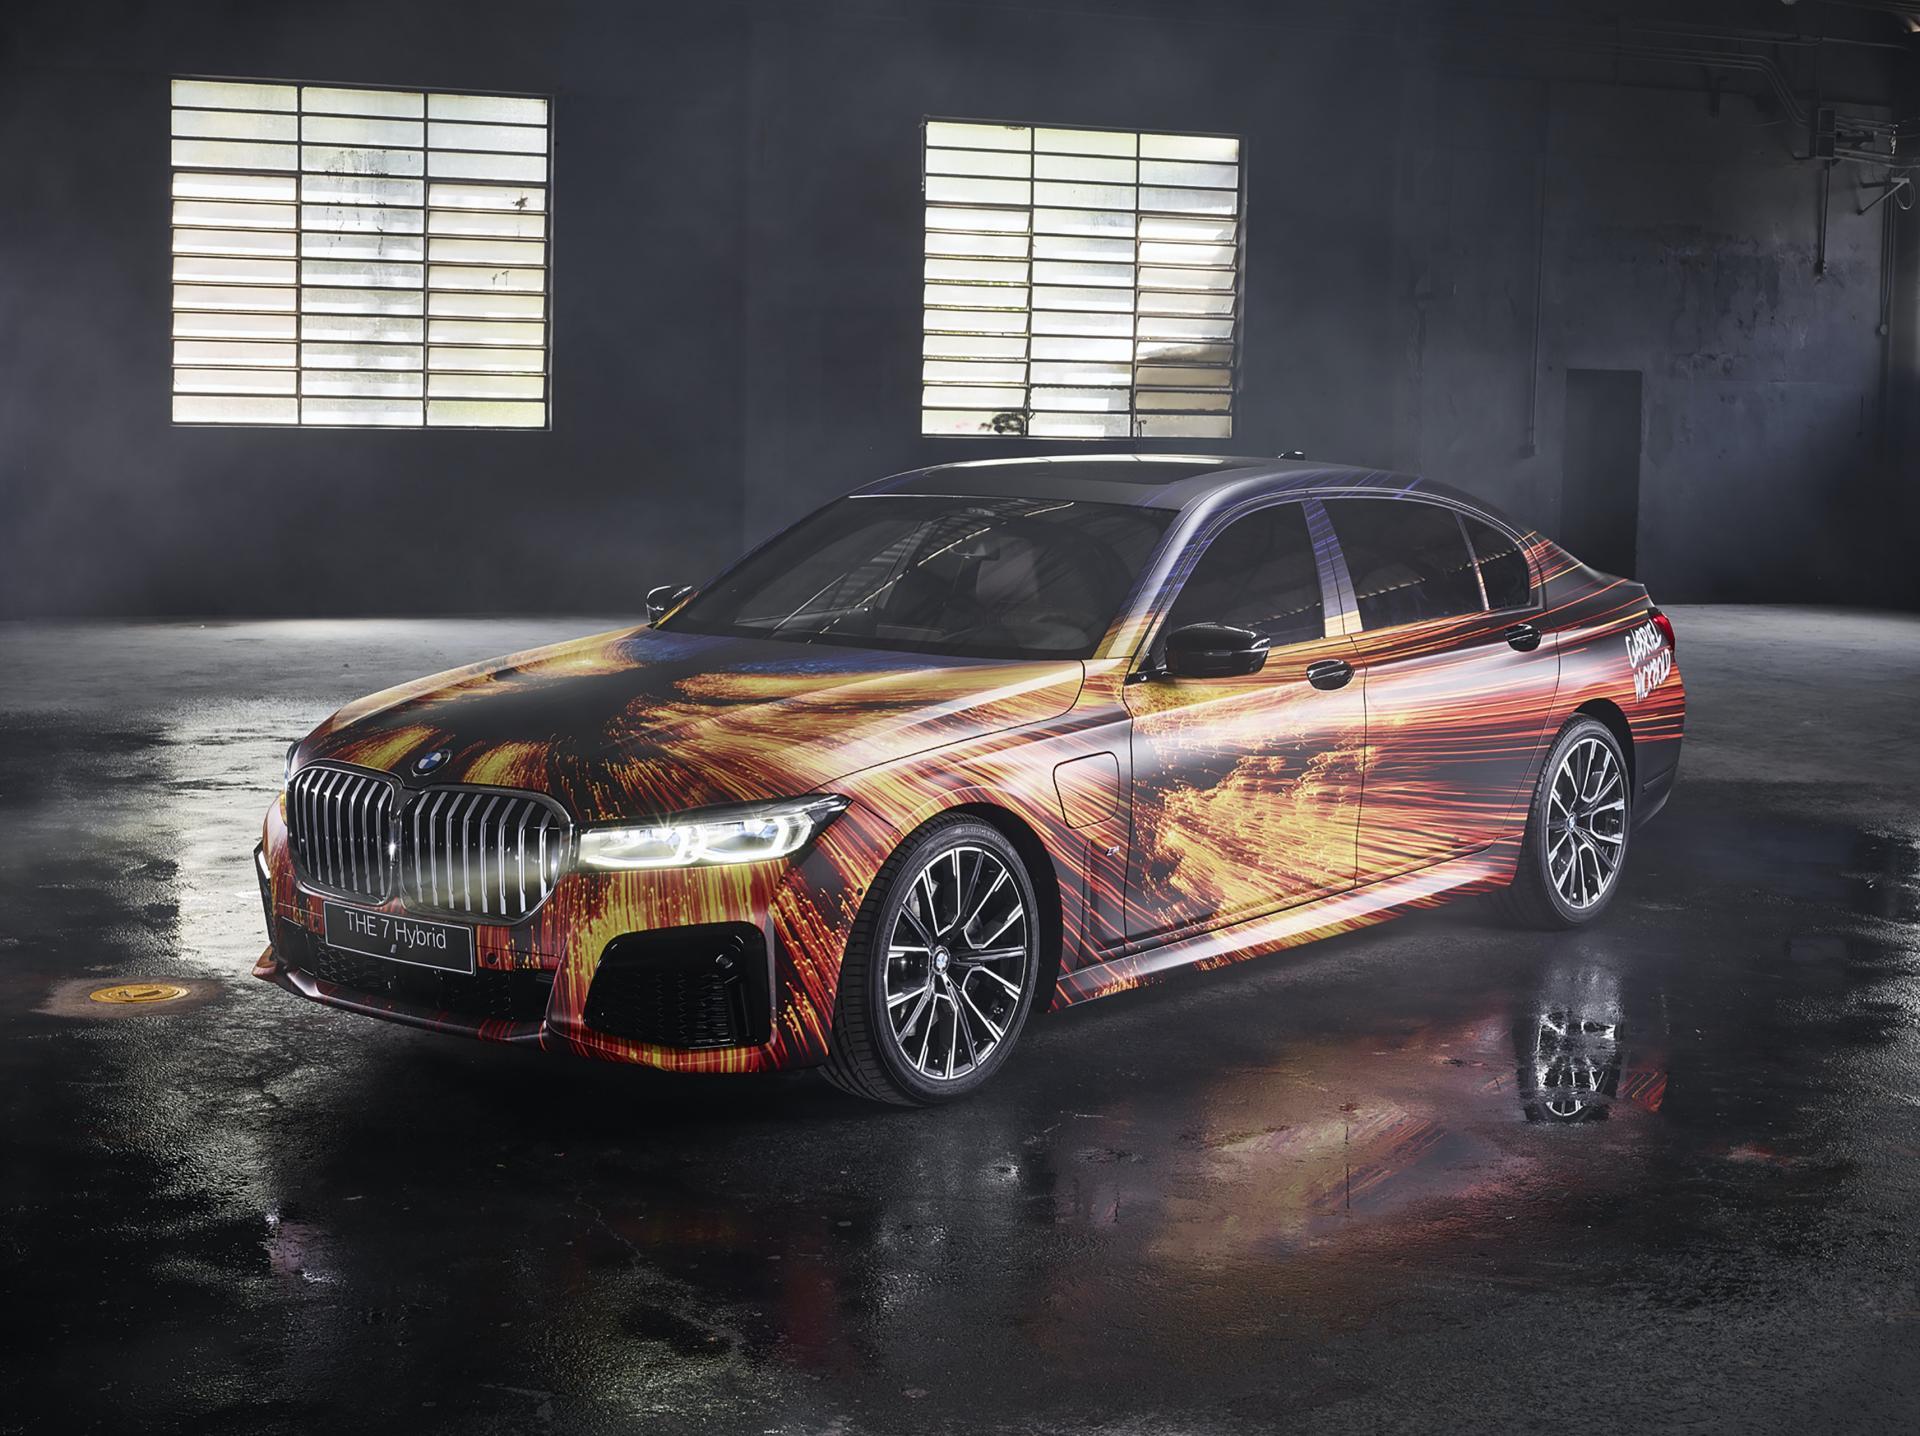 BMW-7-Series-745Le-M-Sport-Gabriel-Wickbold-Car-Art-13